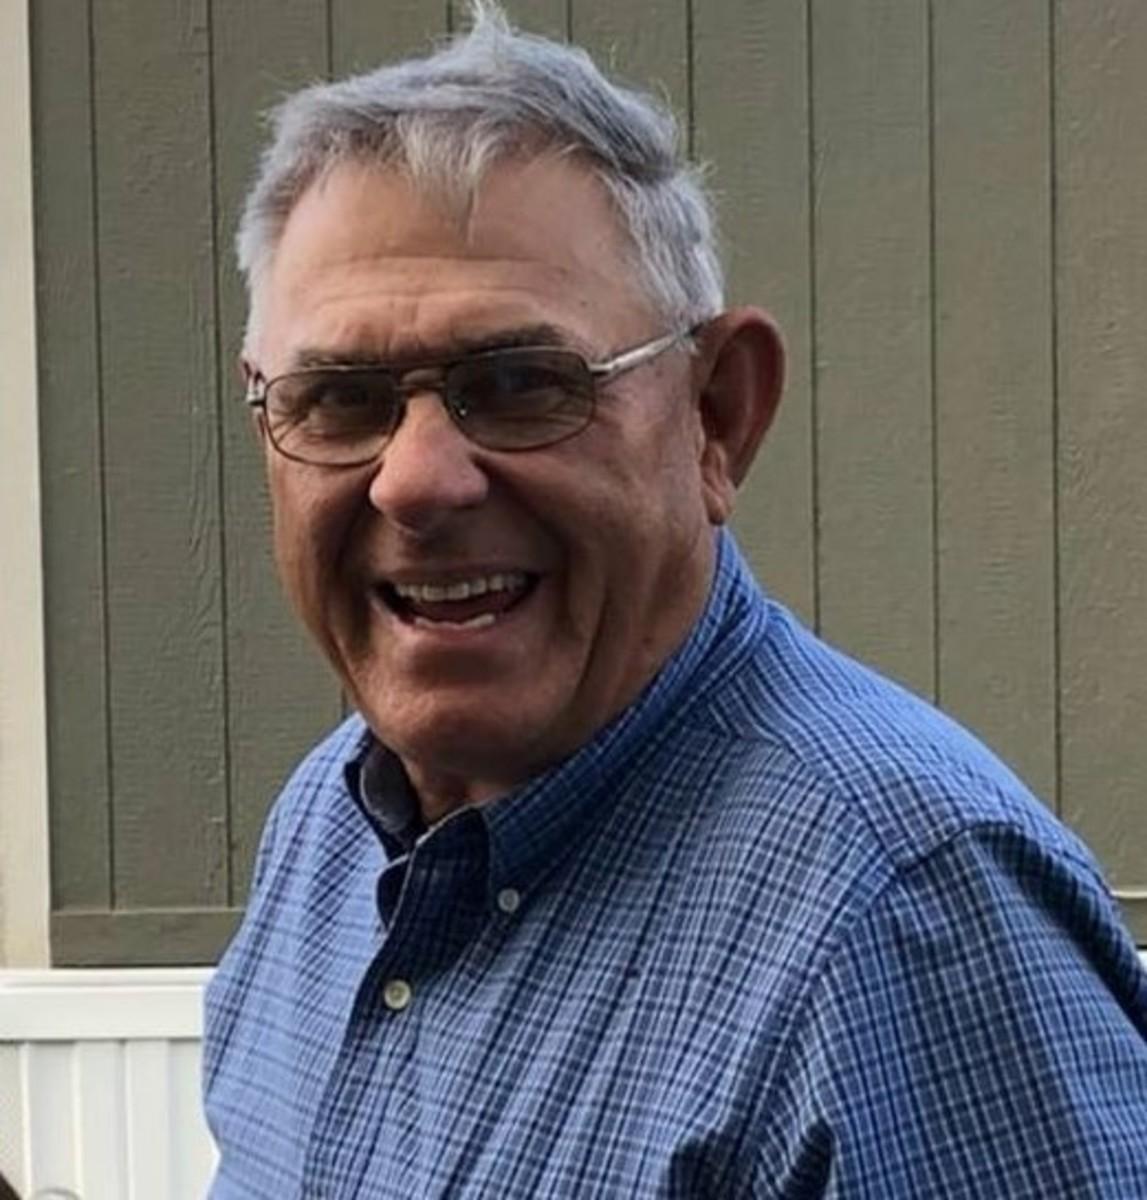 Robert Kindla, lifelong member of Southside Community. Former board member and candidate for Southside ISD School Board. Position 7.